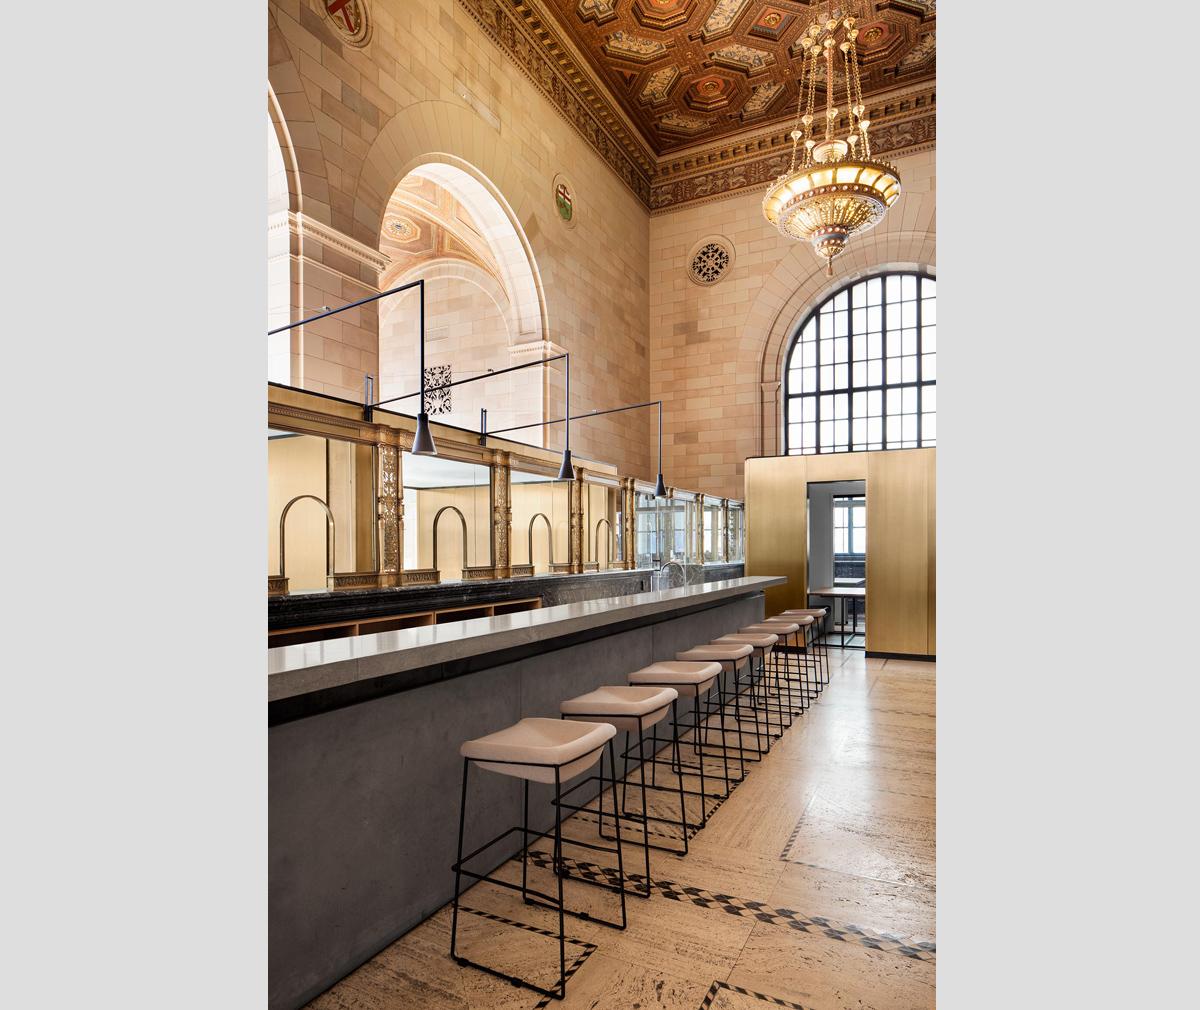 Crew Collective Café - Montreal restaurants for design lovers